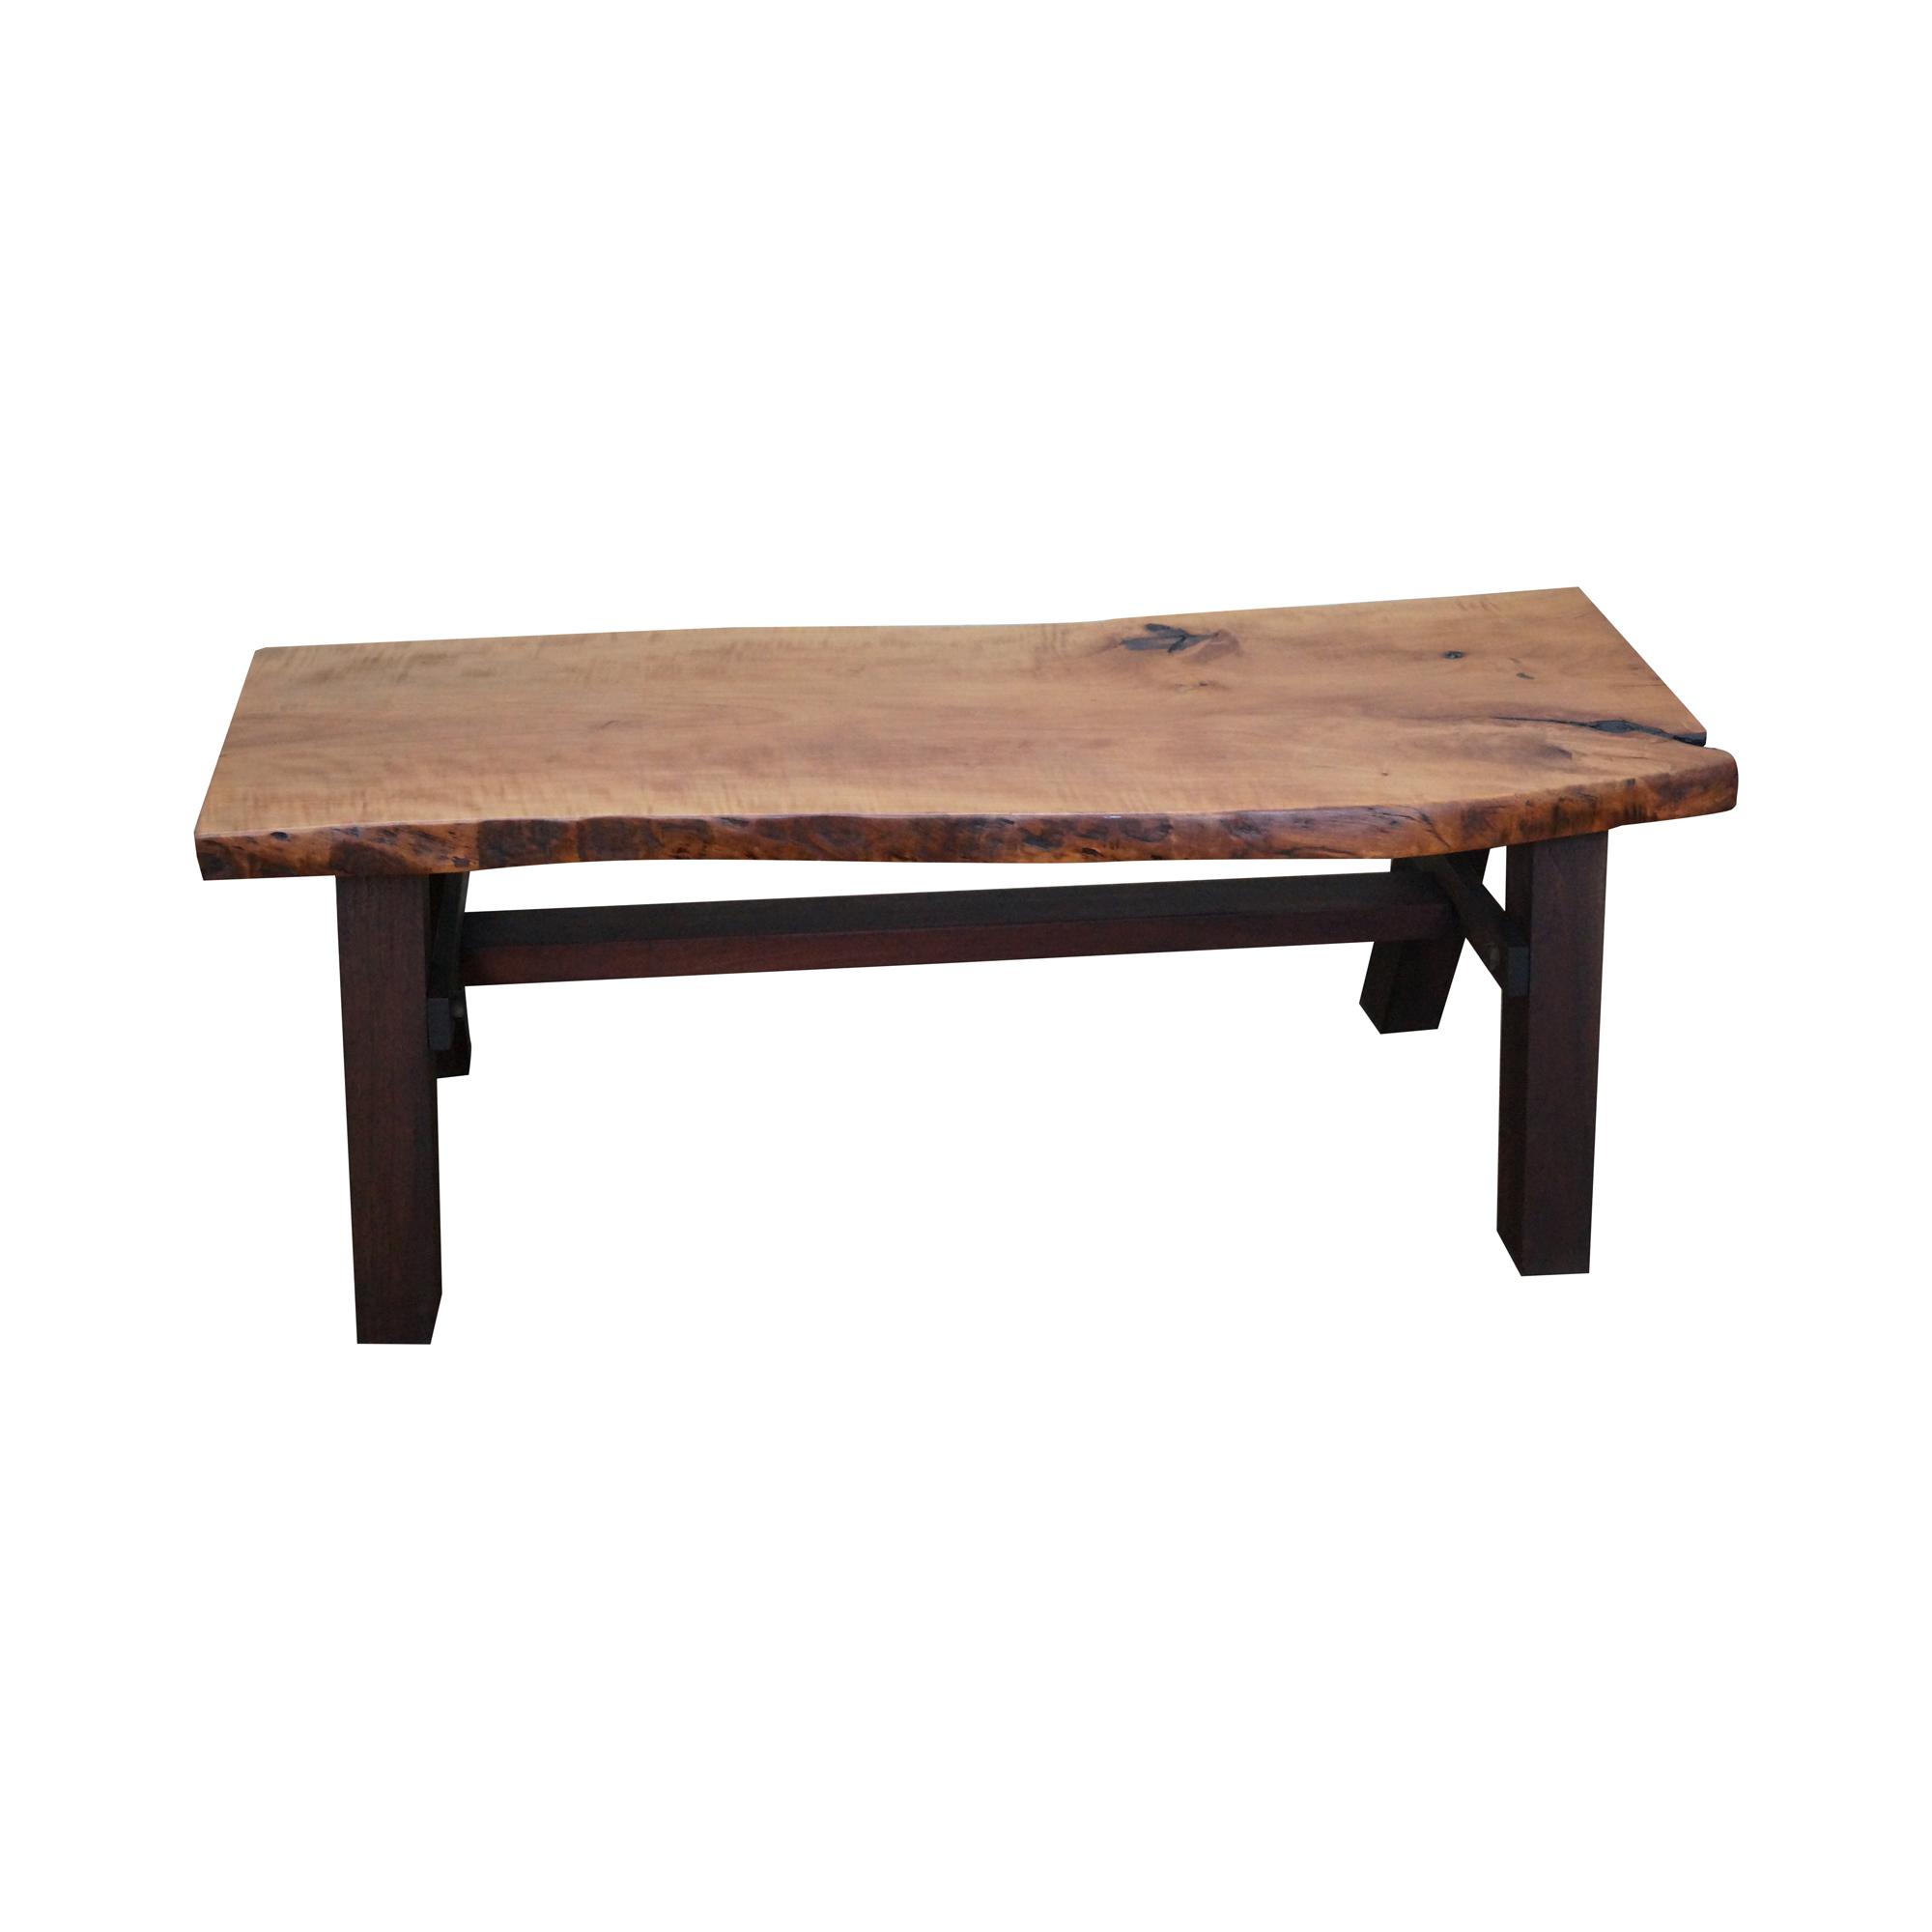 bucks county studio made free form coffee table  chairish - image of bucks county studio made free form coffee table